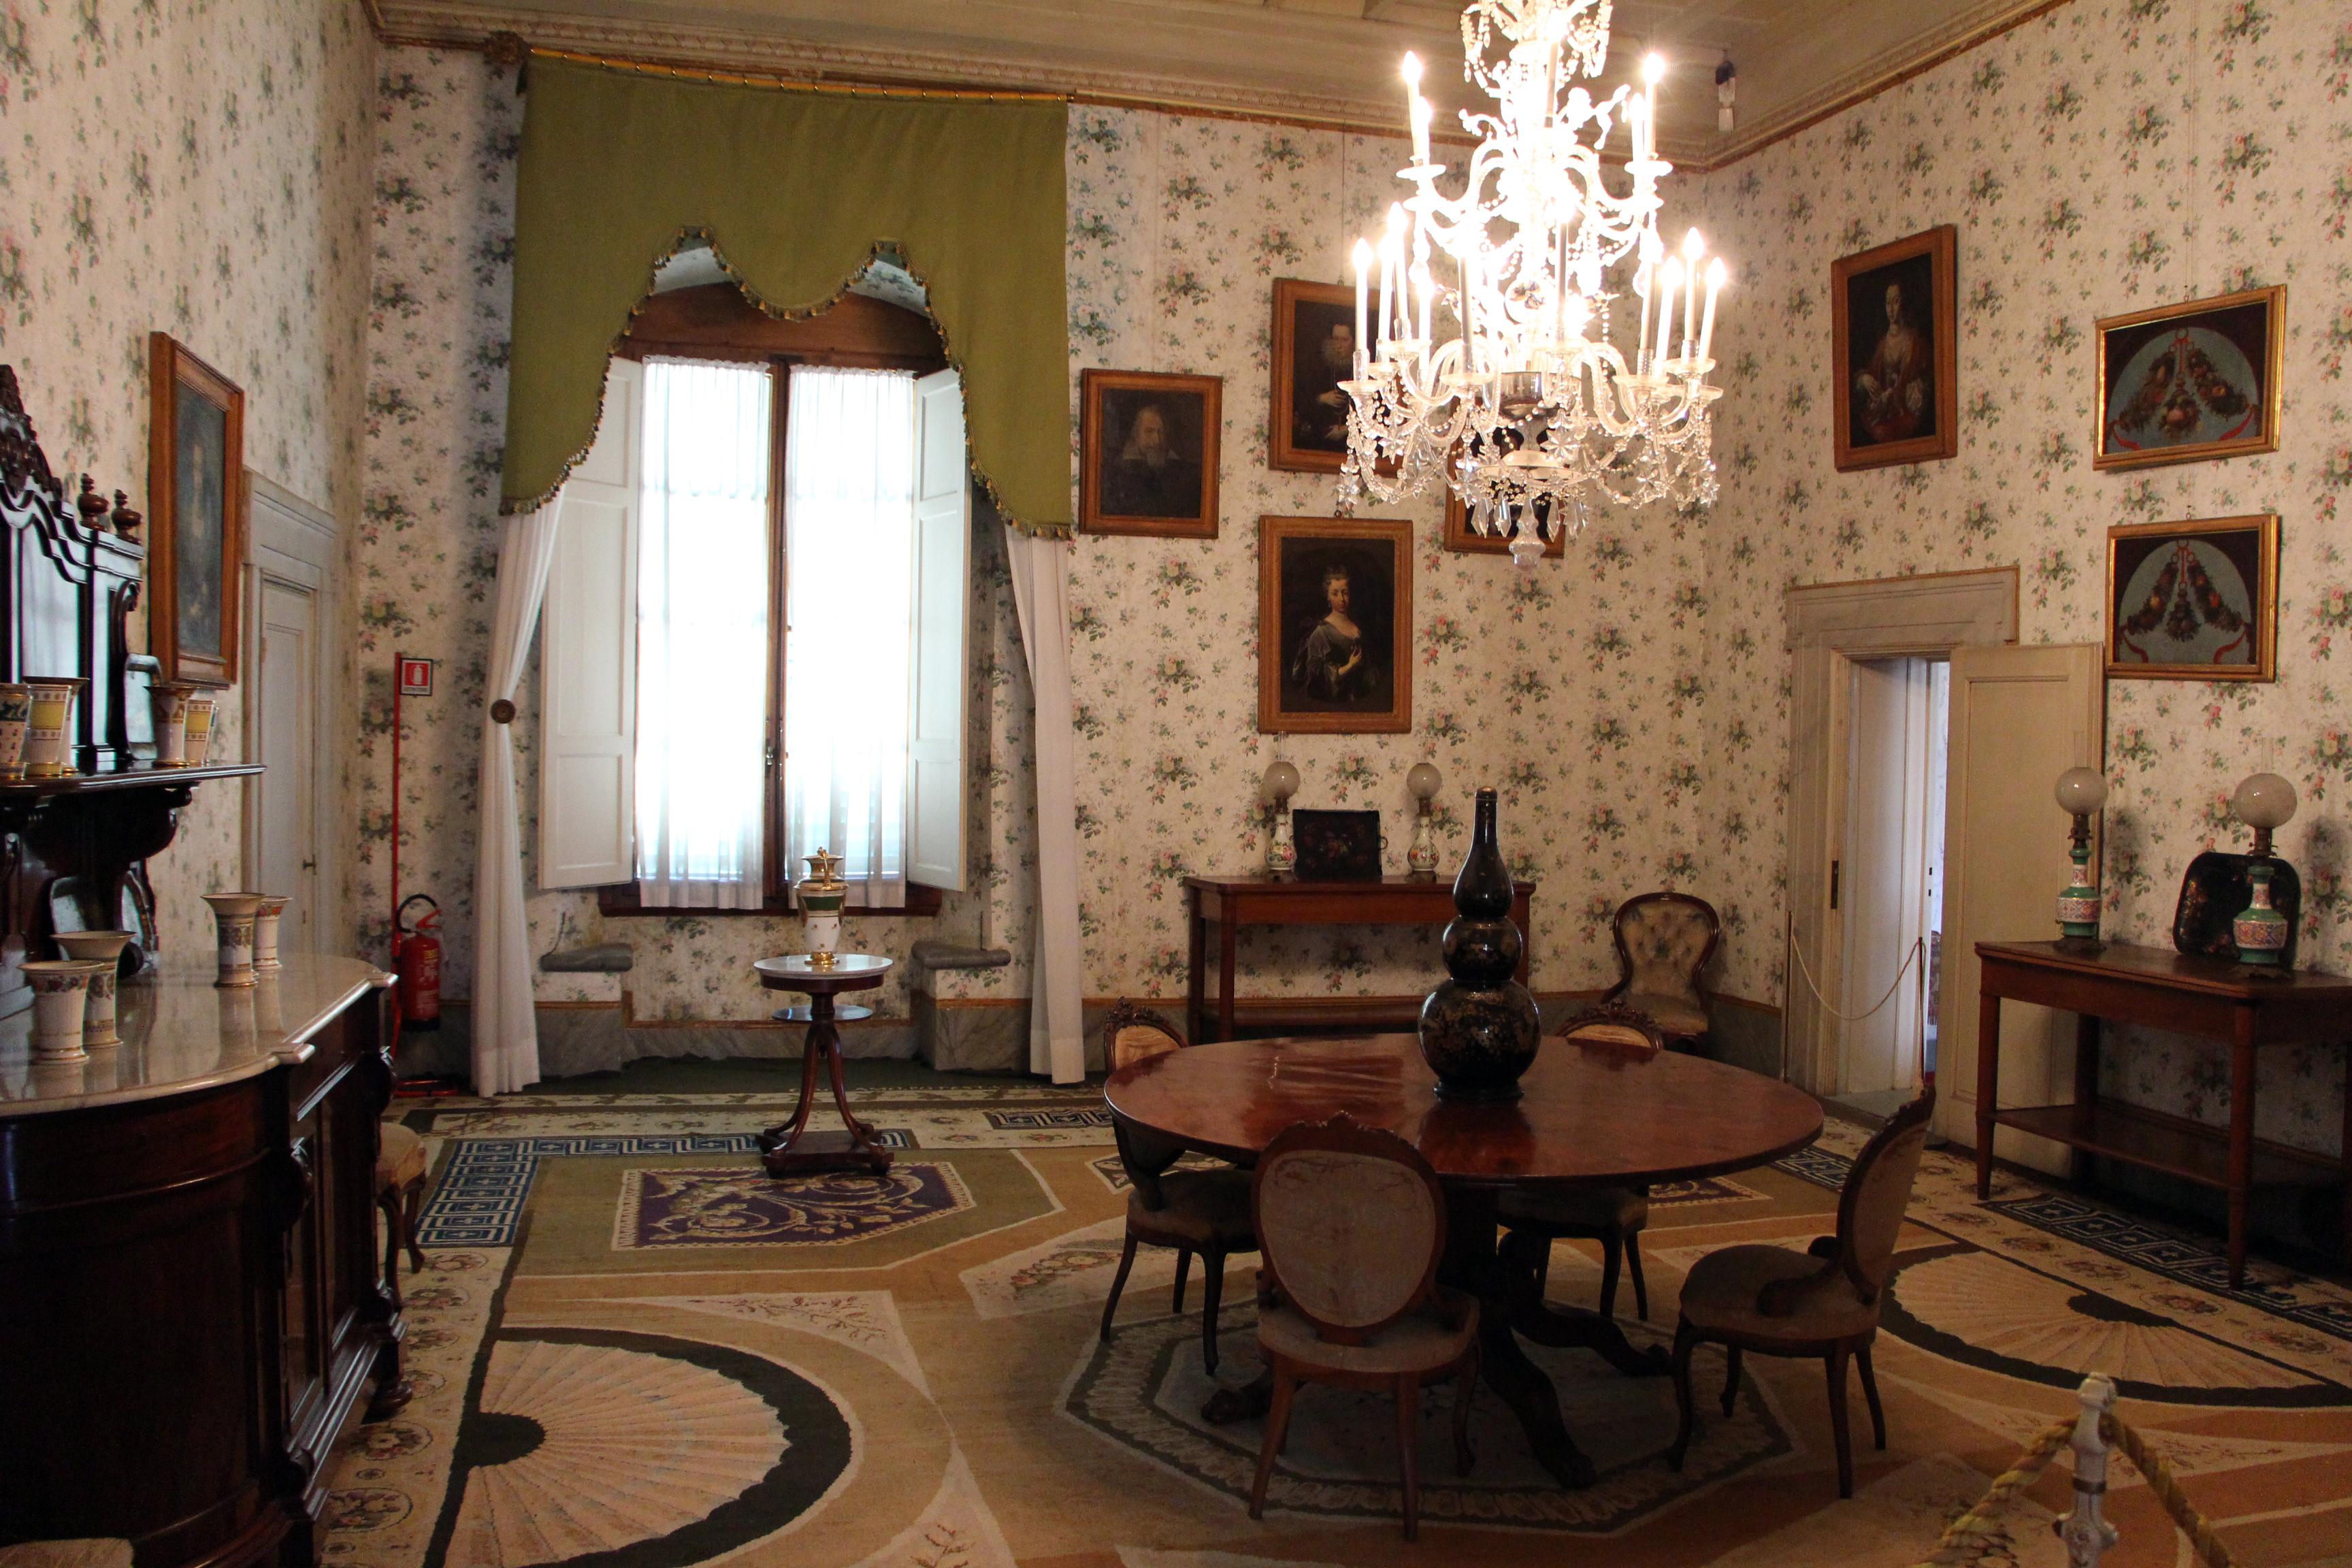 File:Sala da pranzo, la petraia 02.JPG - Wikimedia Commons